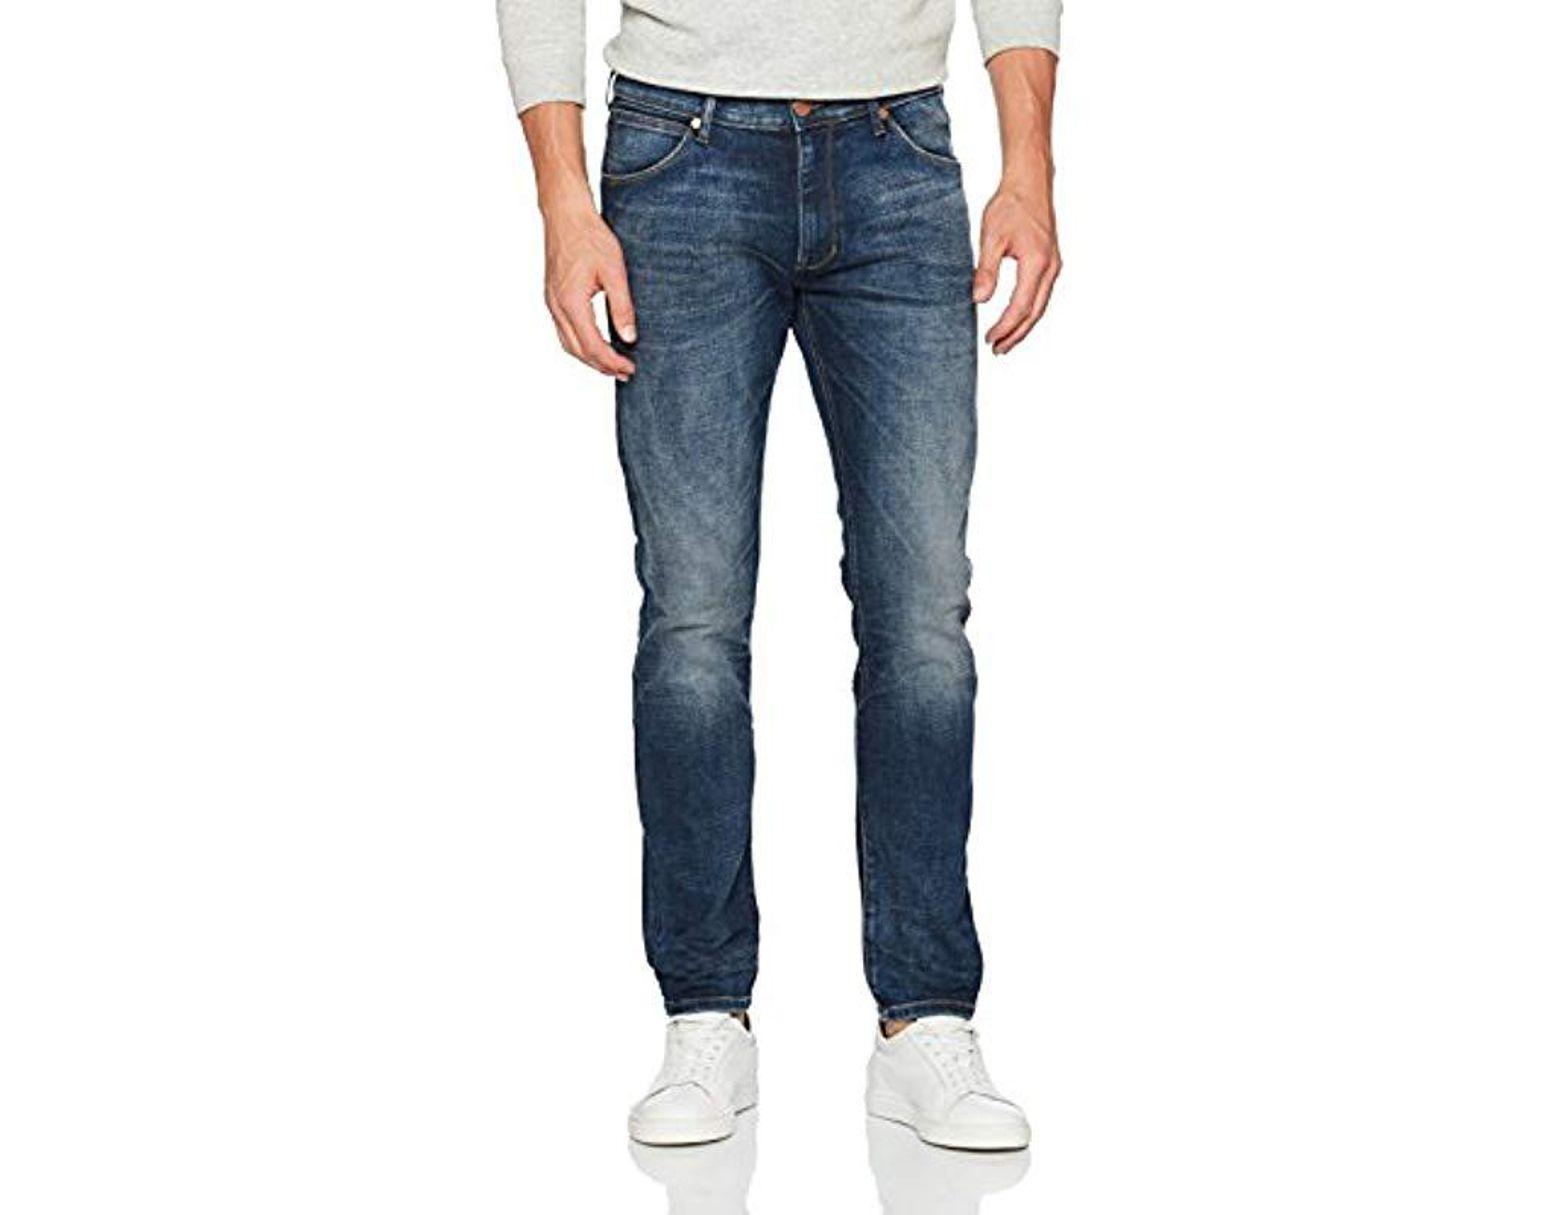 9070ddbdb44df Wrangler Larston Slim Tapered Fit Jeans in Blue for Men - Save 63 ...